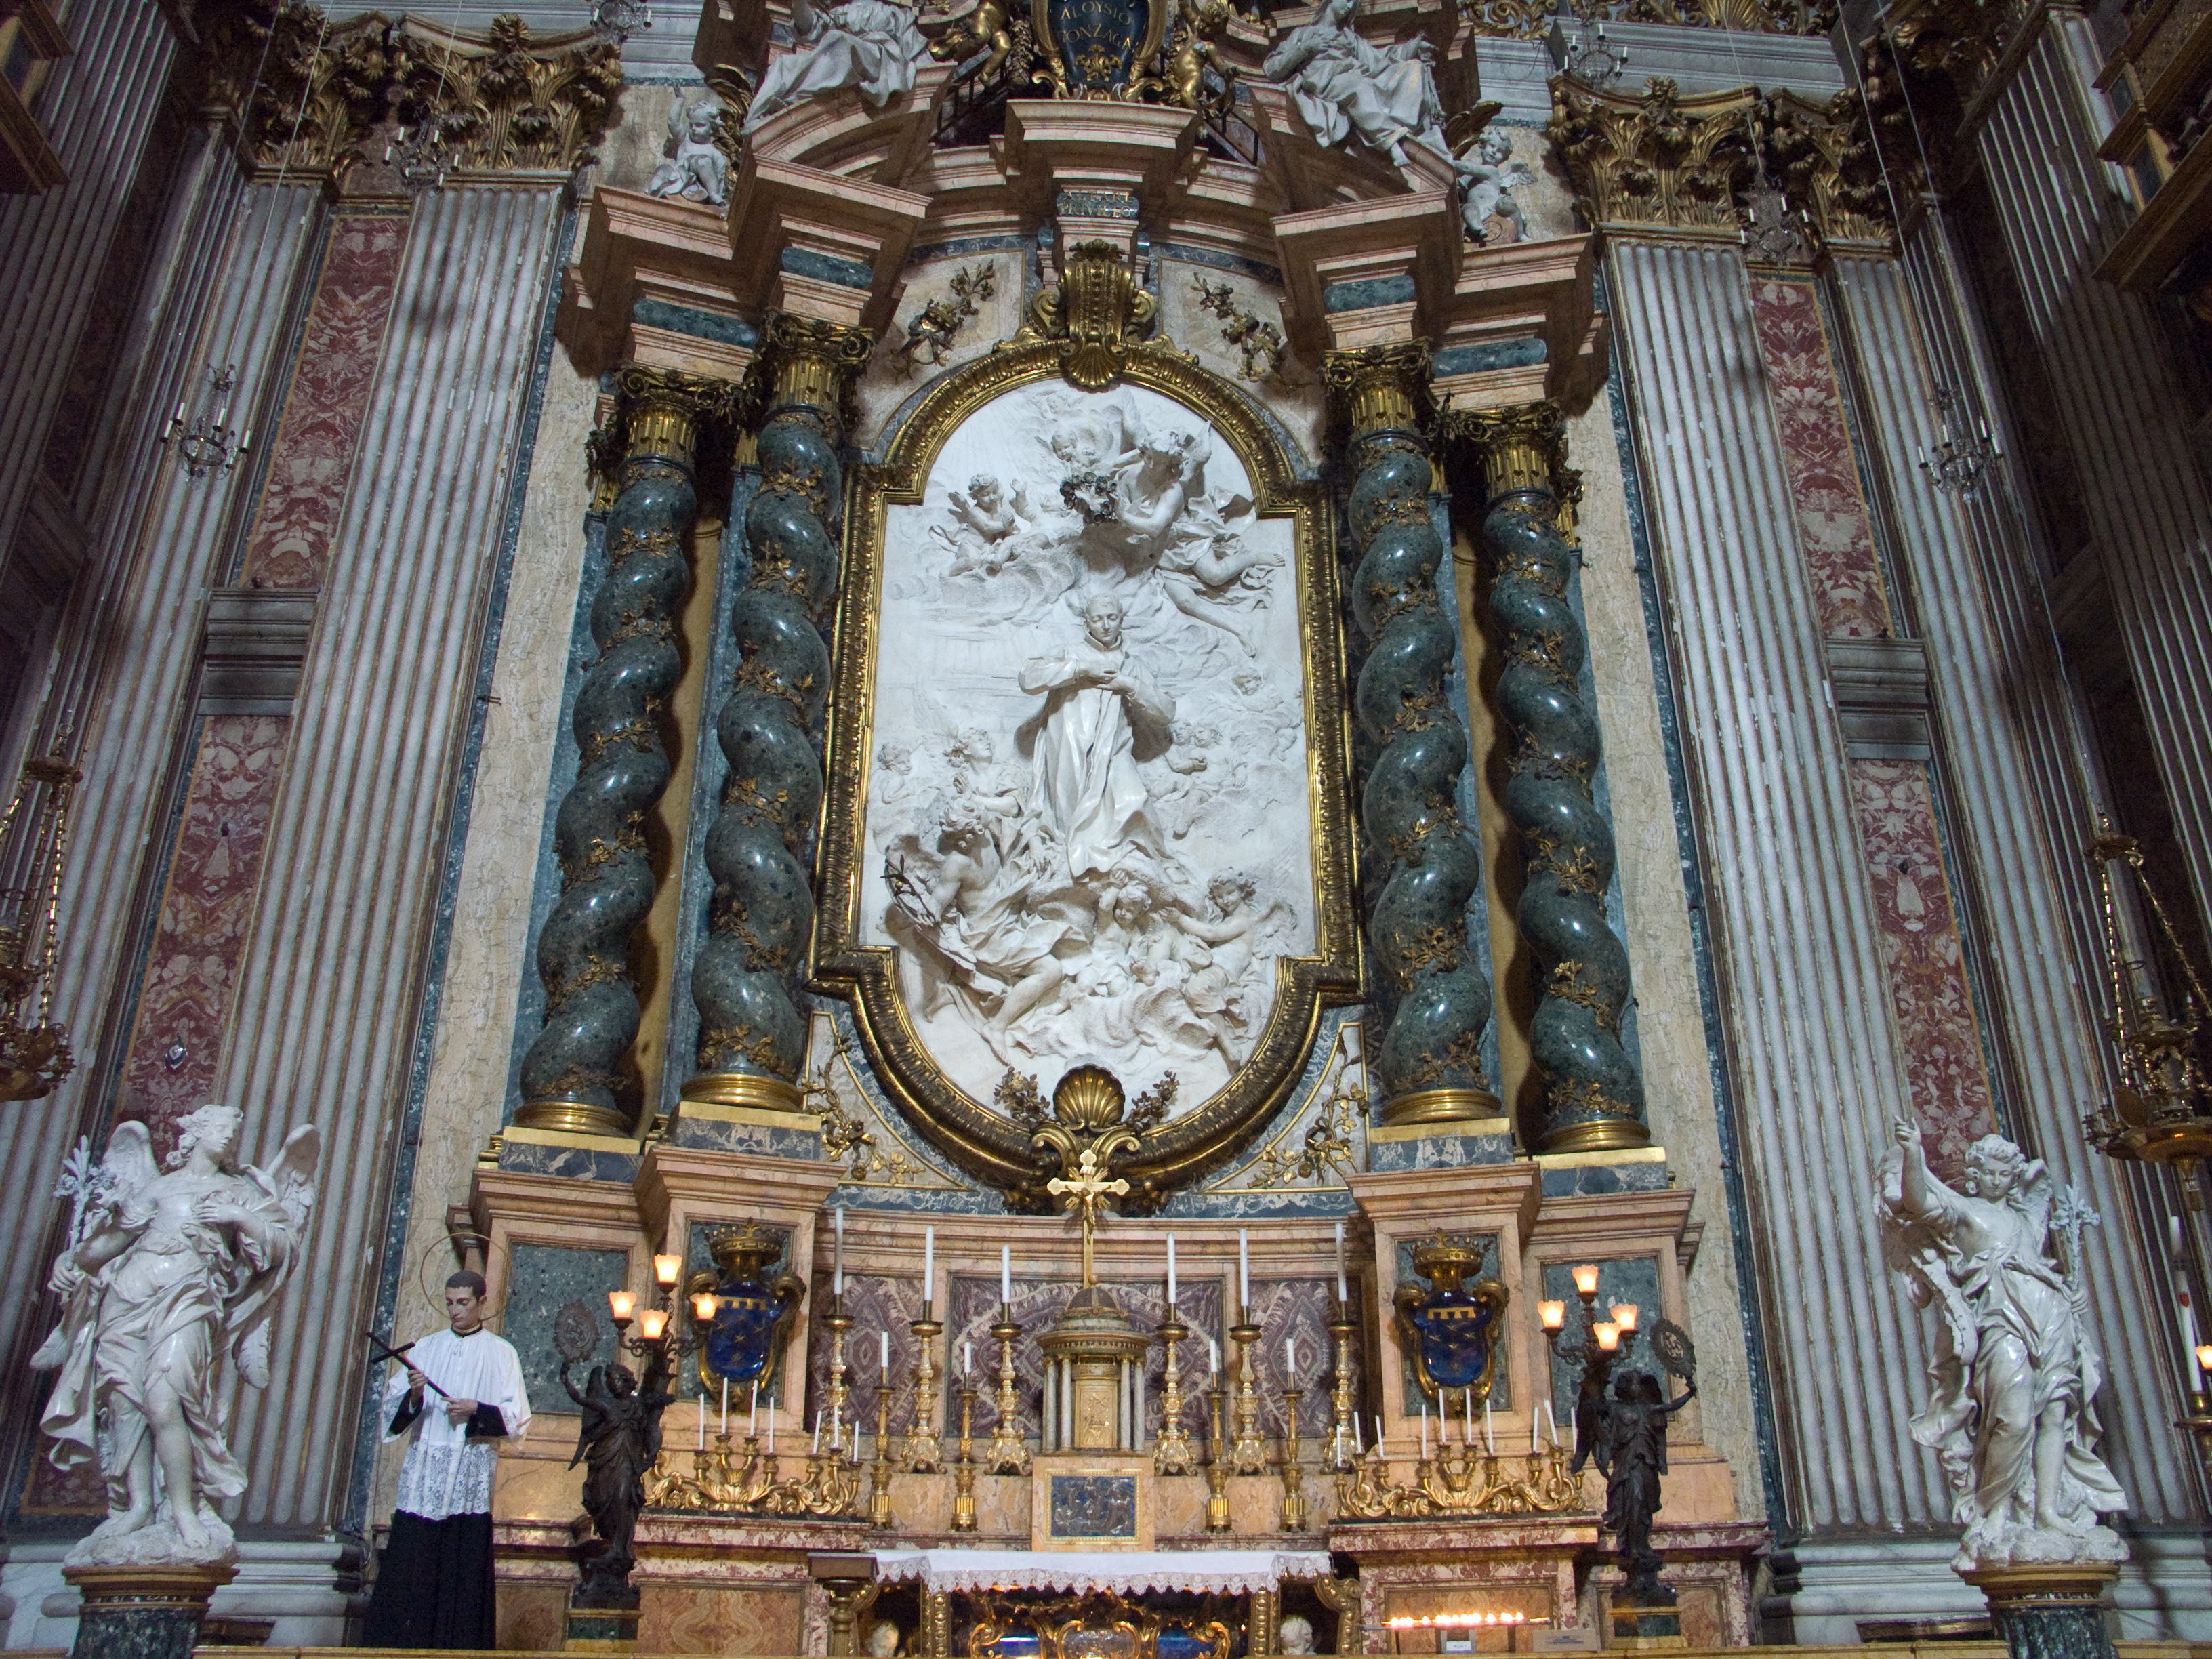 https://upload.wikimedia.org/wikipedia/commons/1/1f/Rome-SantIgnazio-StAloysiusGonzagaGlory.jpg